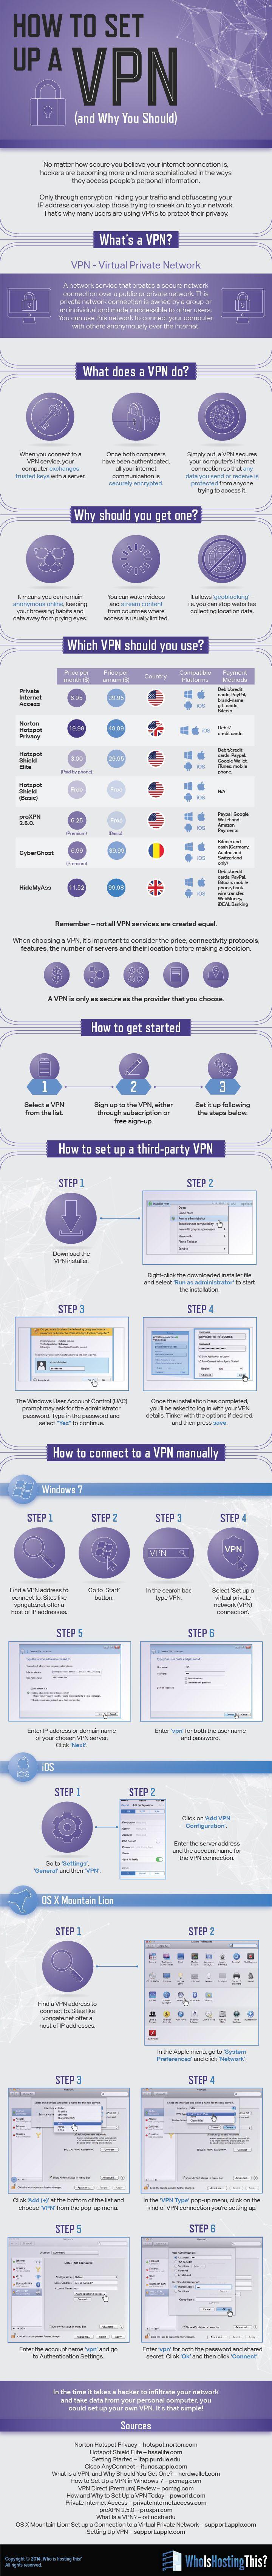 6515eadb7f32d5aa6588e07587390ec6 - How Do I Use A Vpn On My Computer